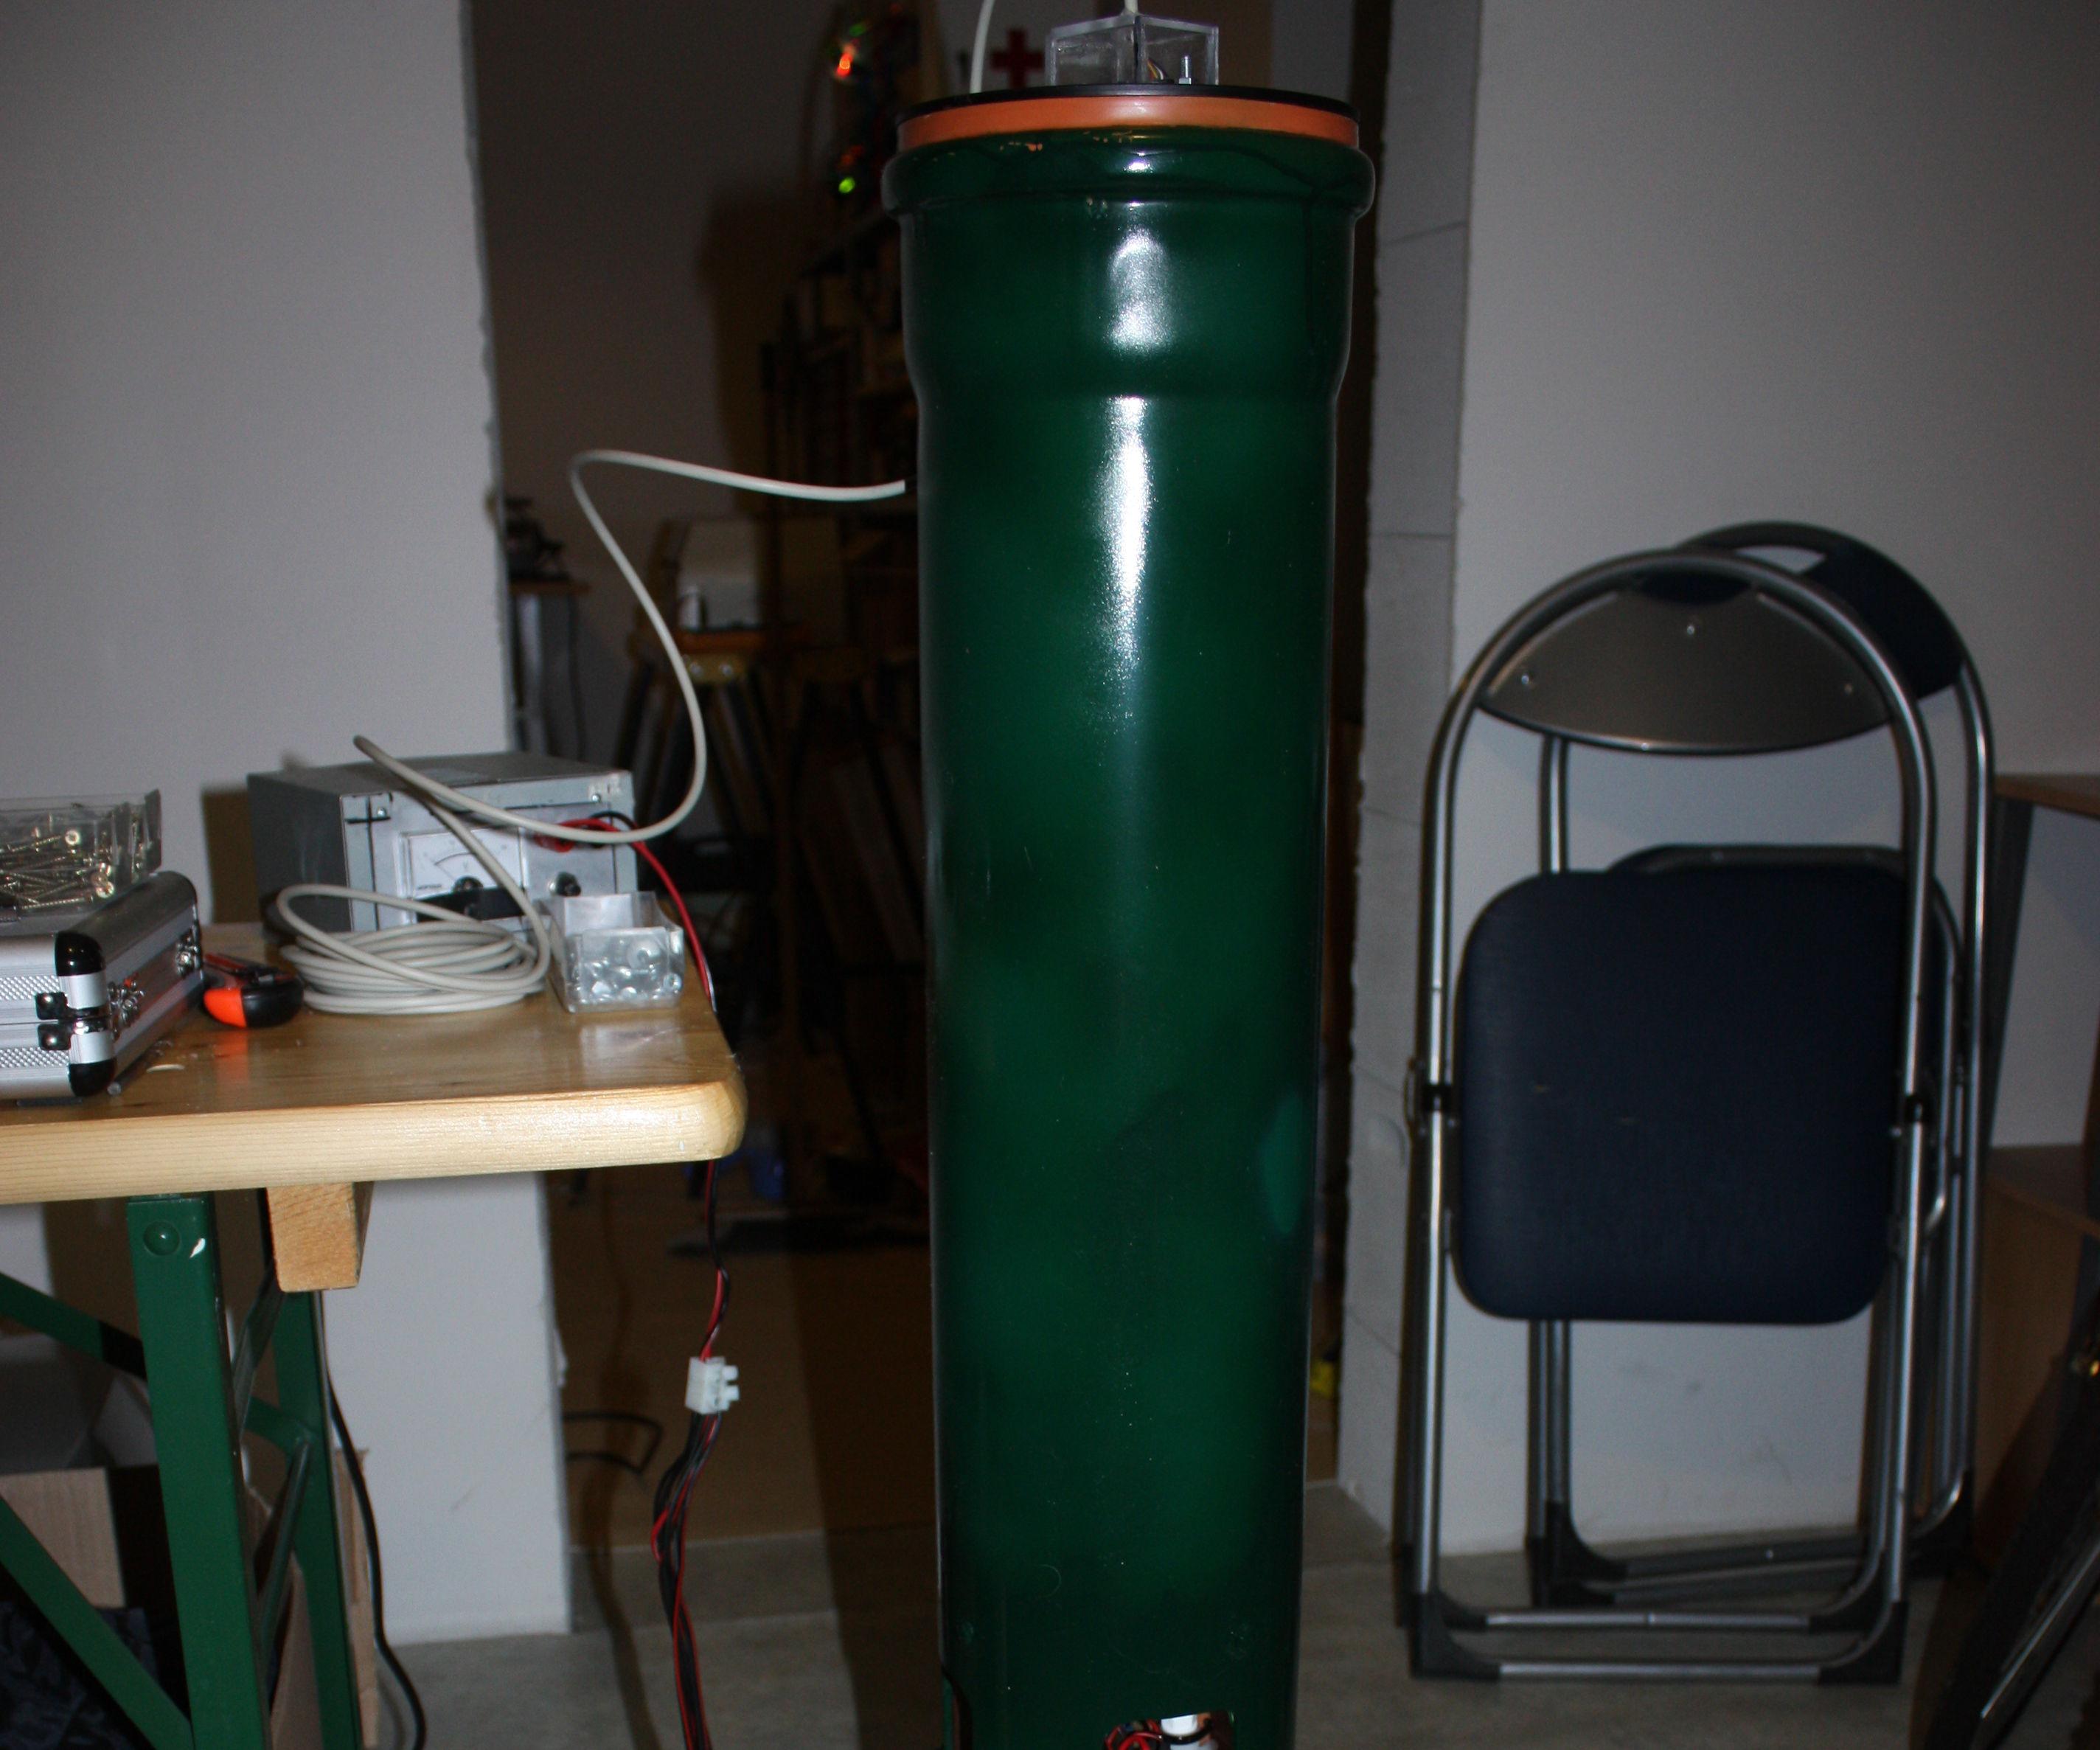 Measuring water level with ultrasonic sensor